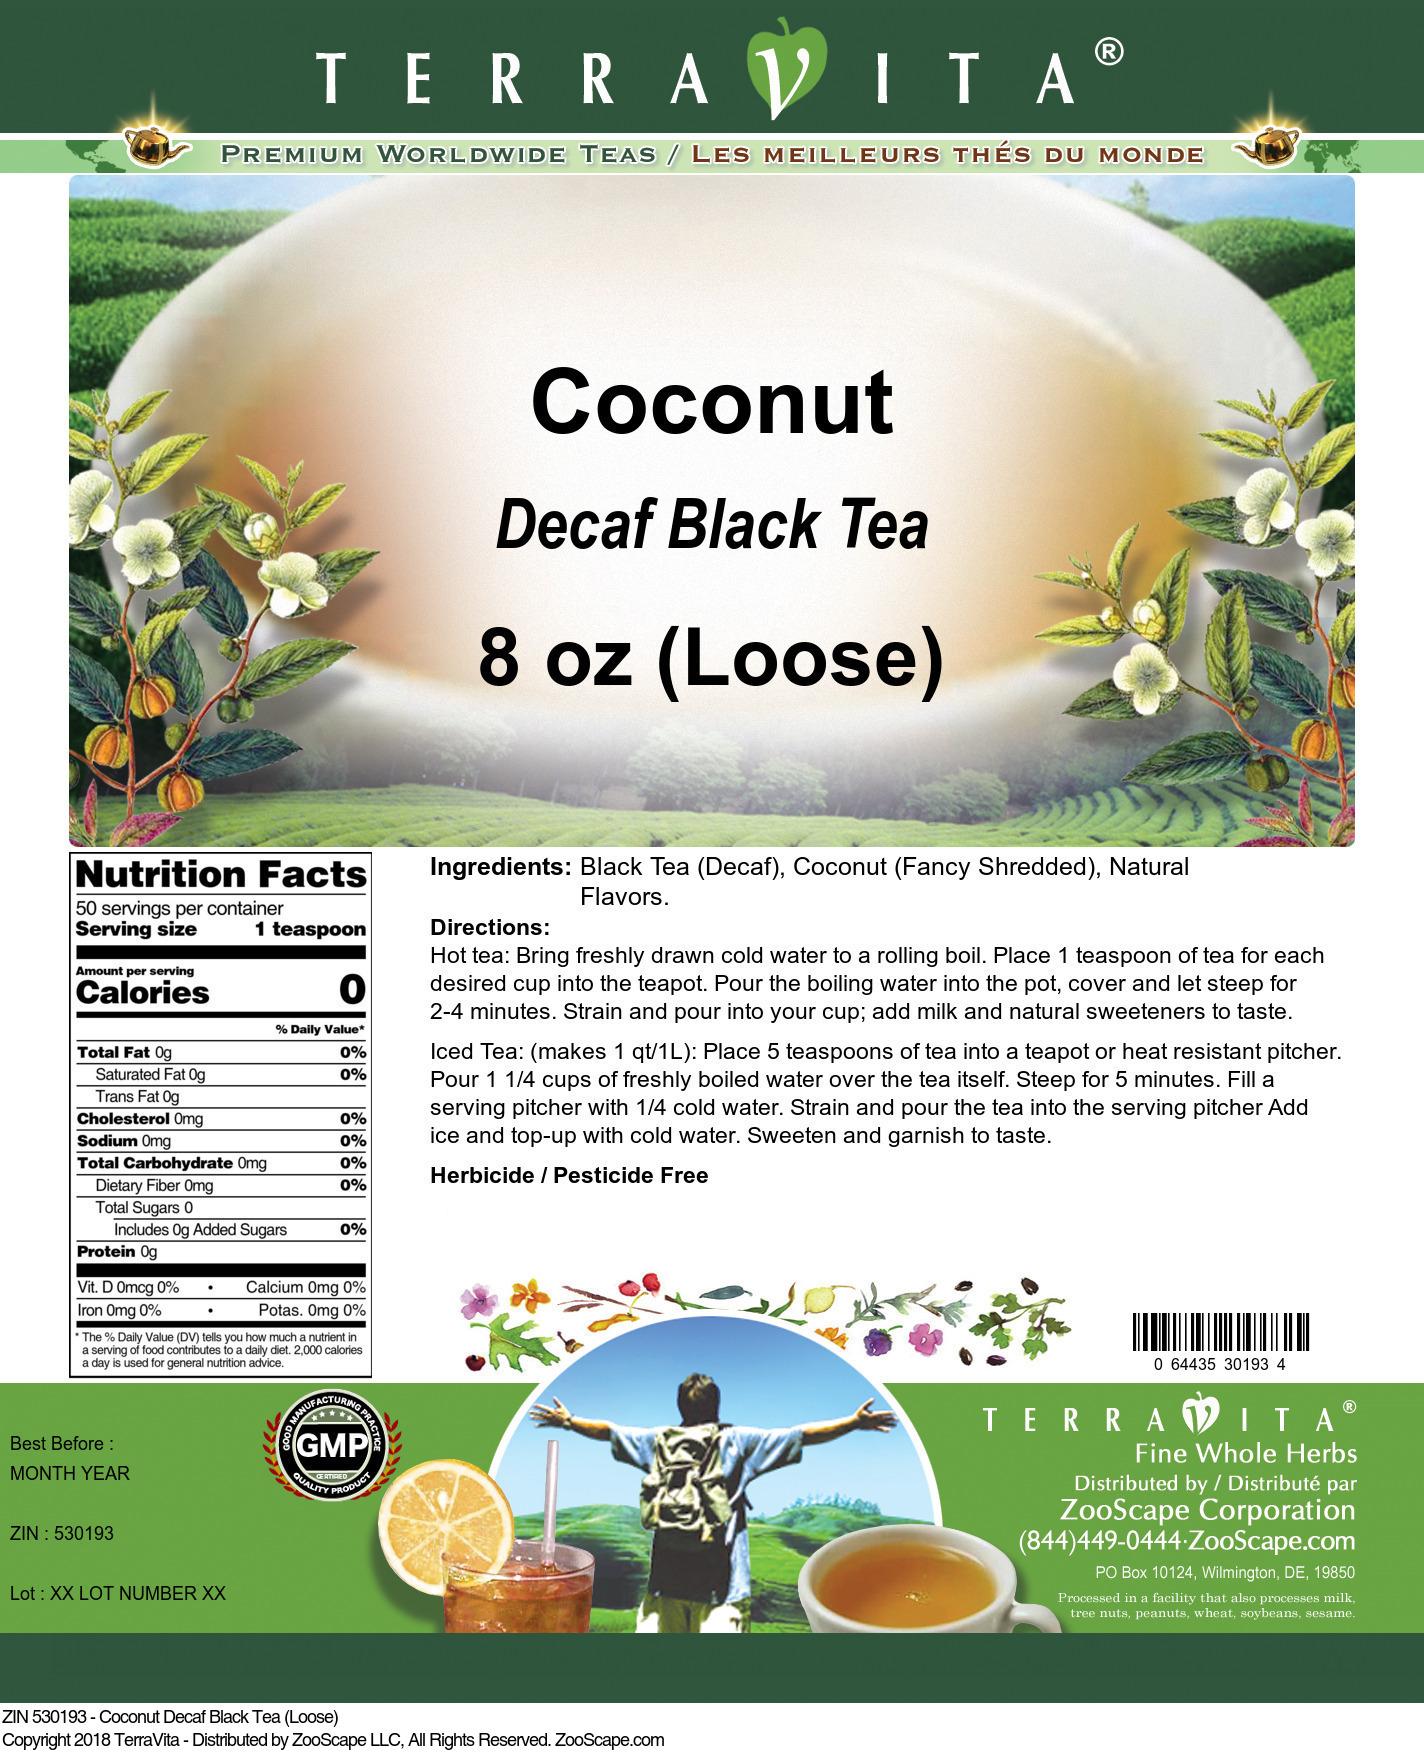 Coconut Decaf Black Tea